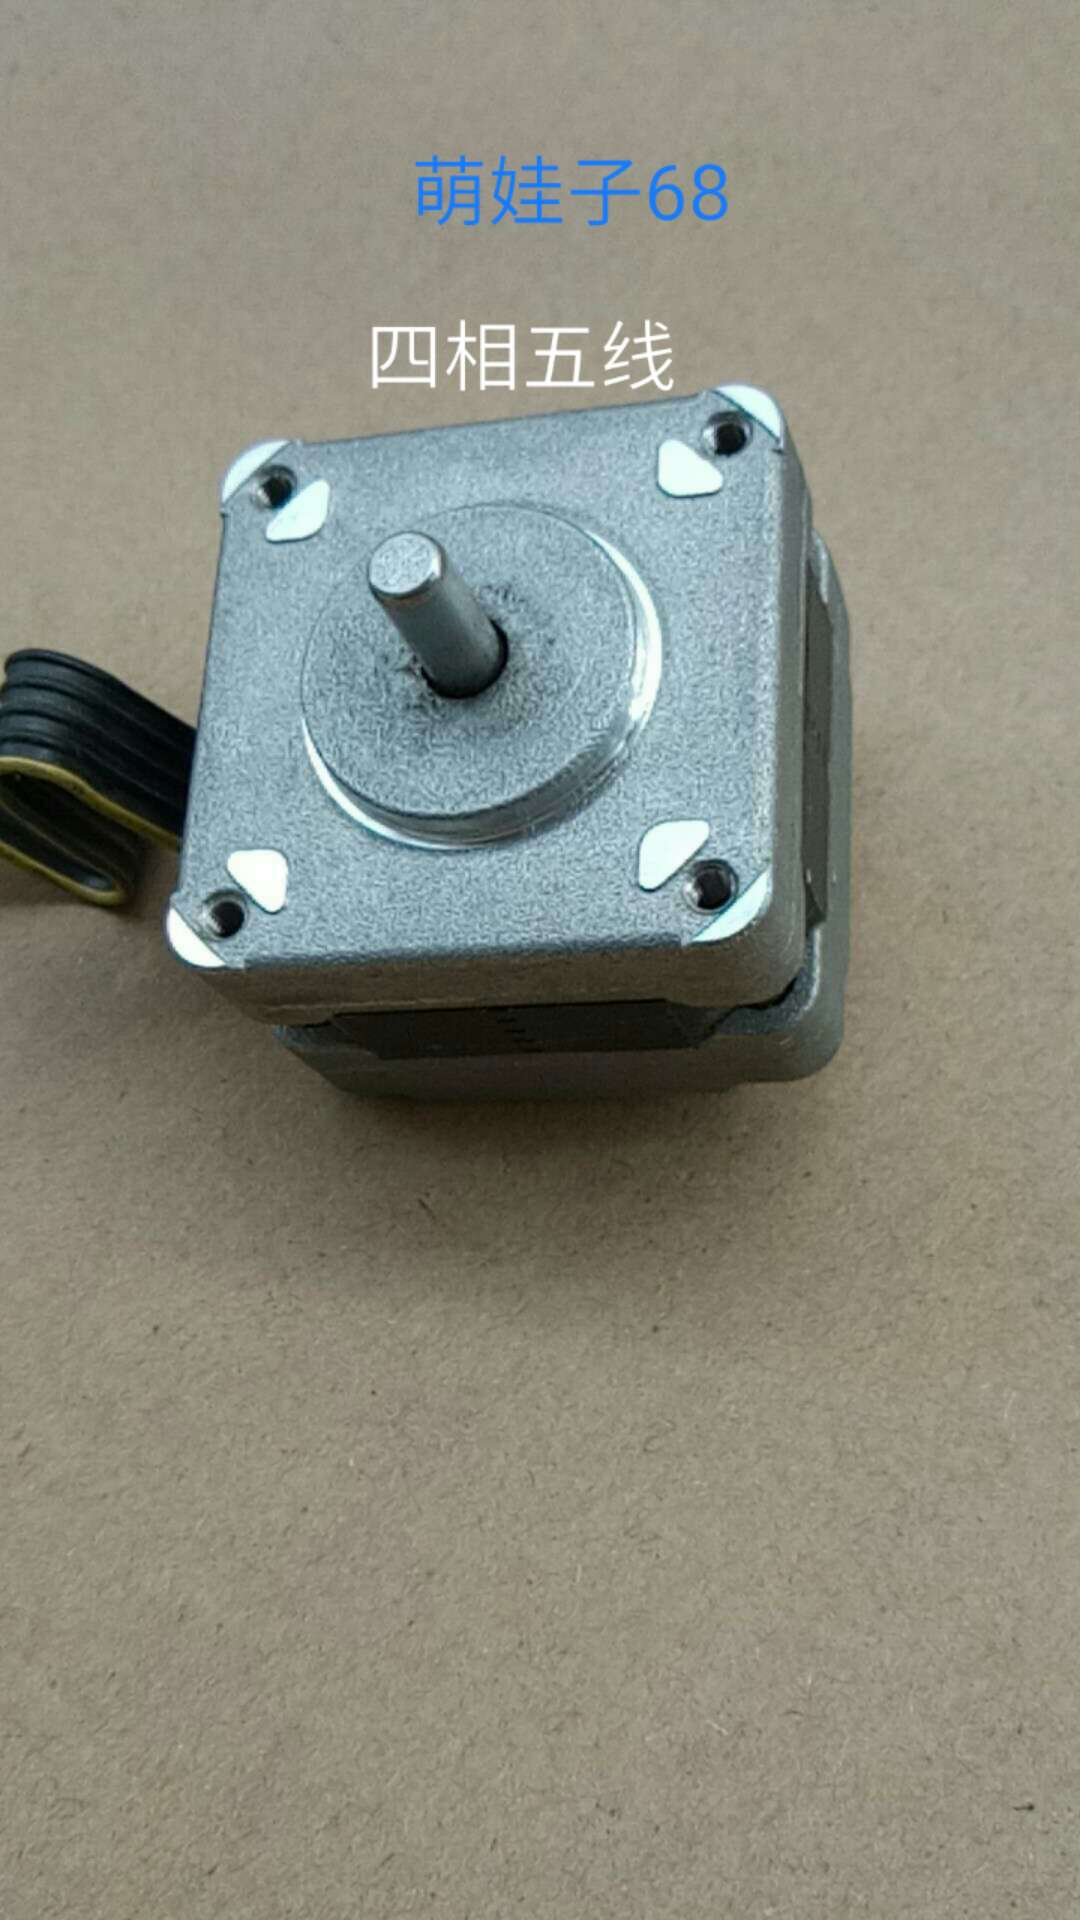 USD 5.22] teac39 stepper motor 70 Euro 1 8deg step angle four-Phase ...